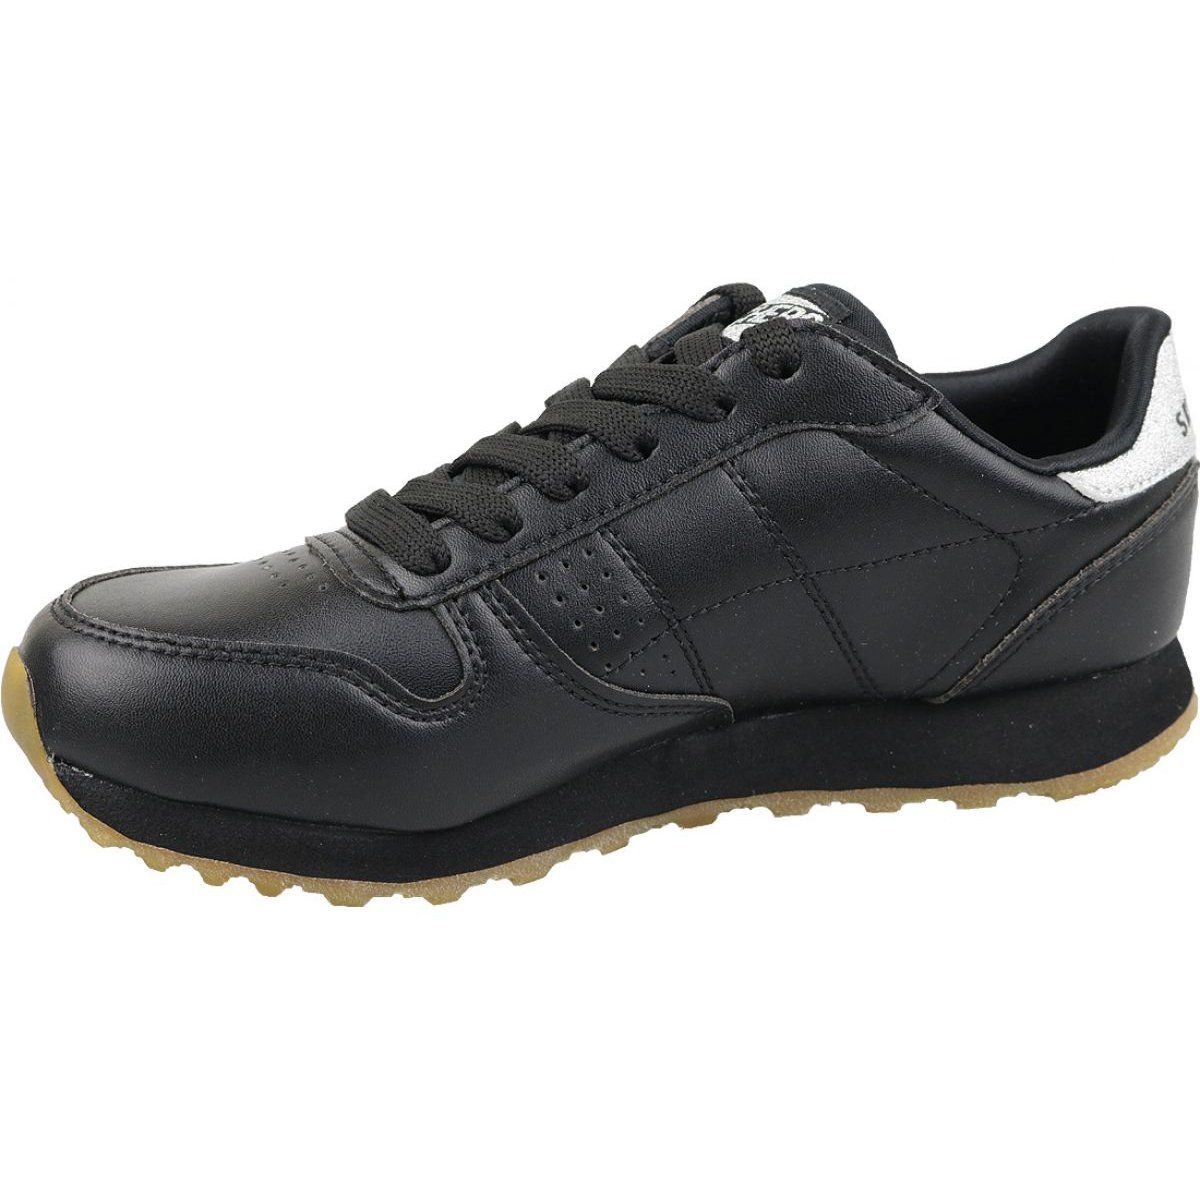 Sports Women S Inny Skechers Og 85 Old School Cool W 699 Blk Shoes Black Skechers Black Shoes All Black Sneakers